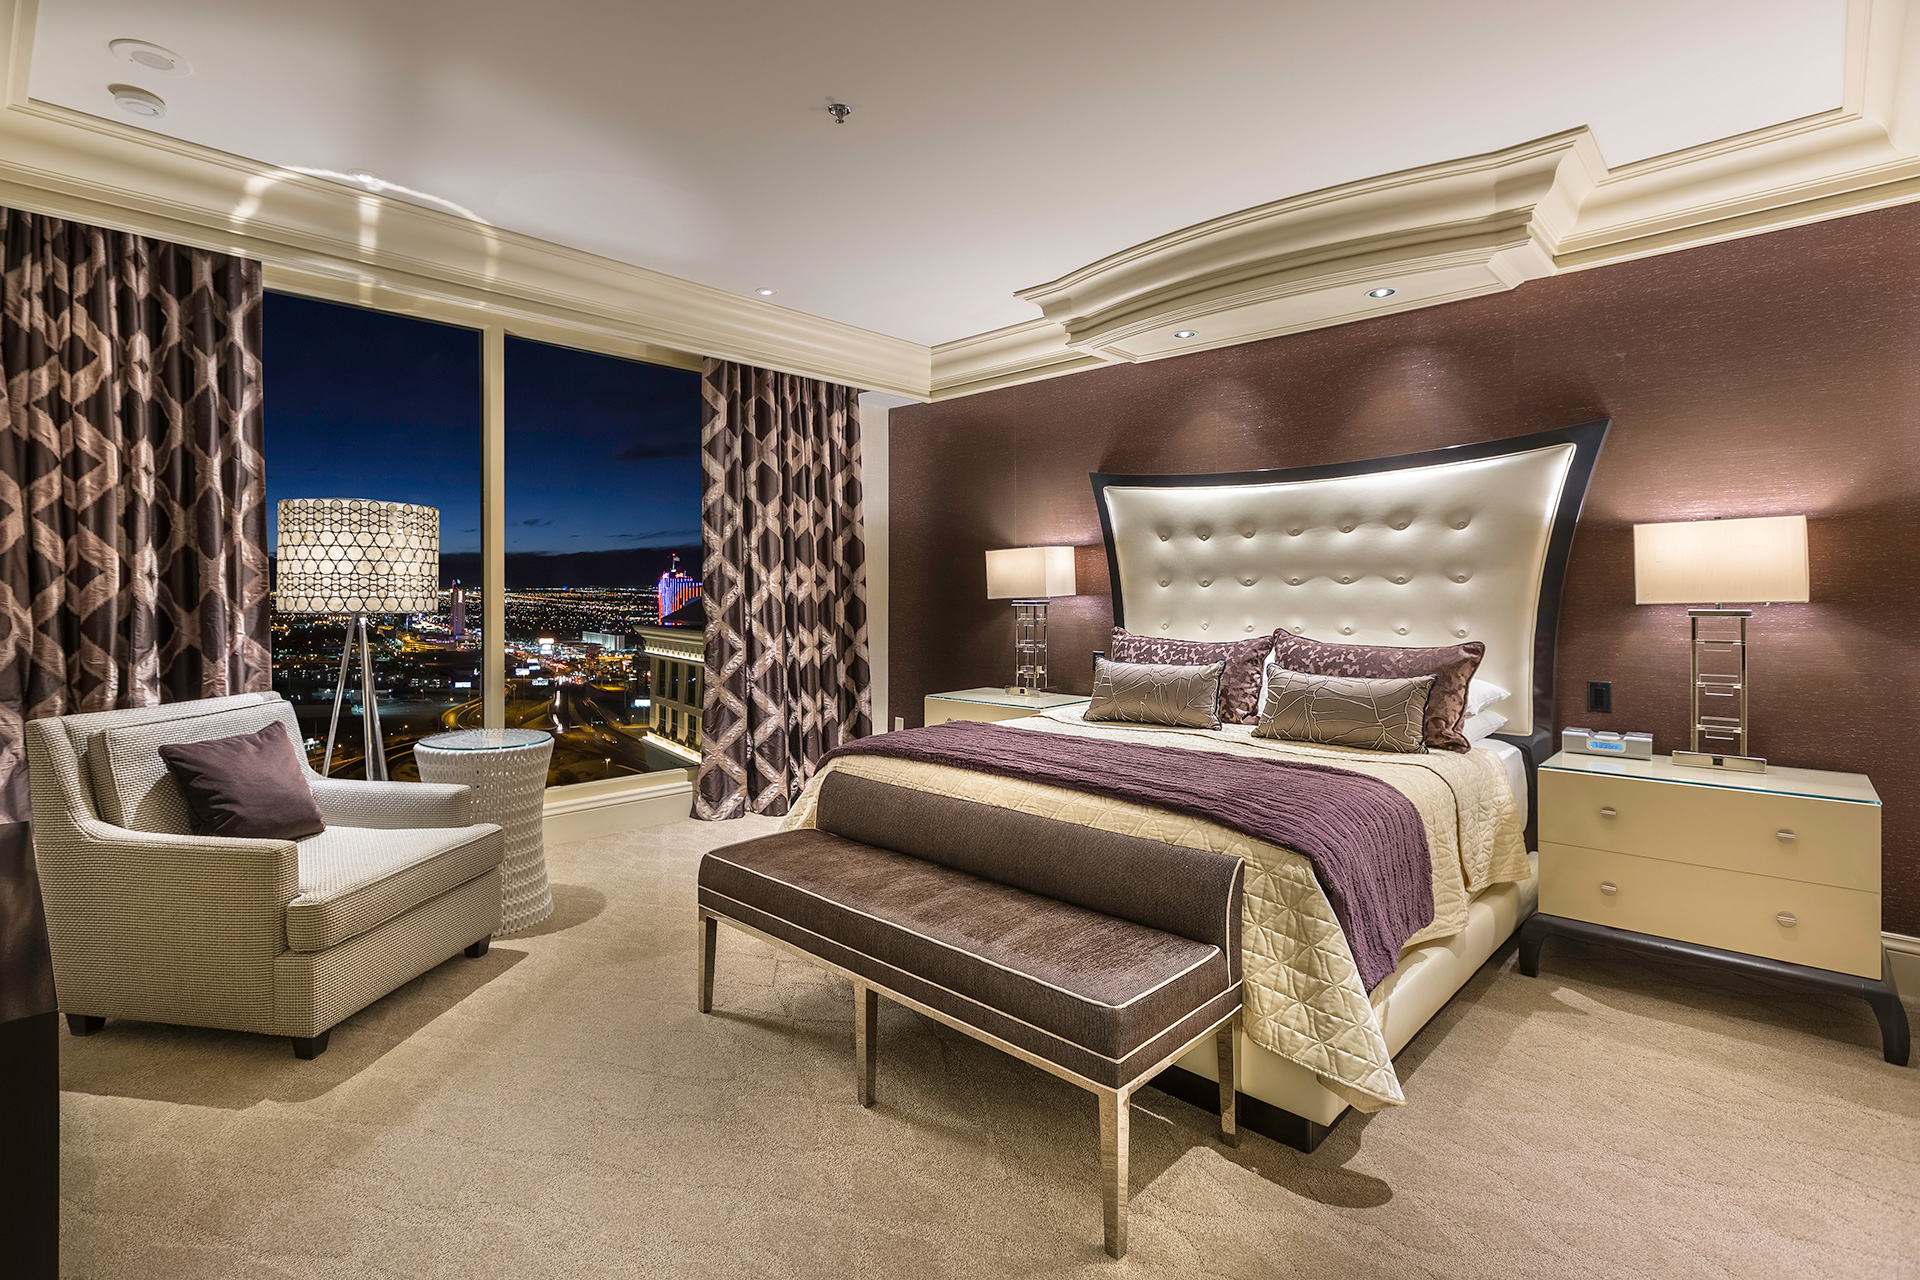 BellagioSuite35 011 03 Sage Aria 22 Luxury Home Photography Las Vegas 2016